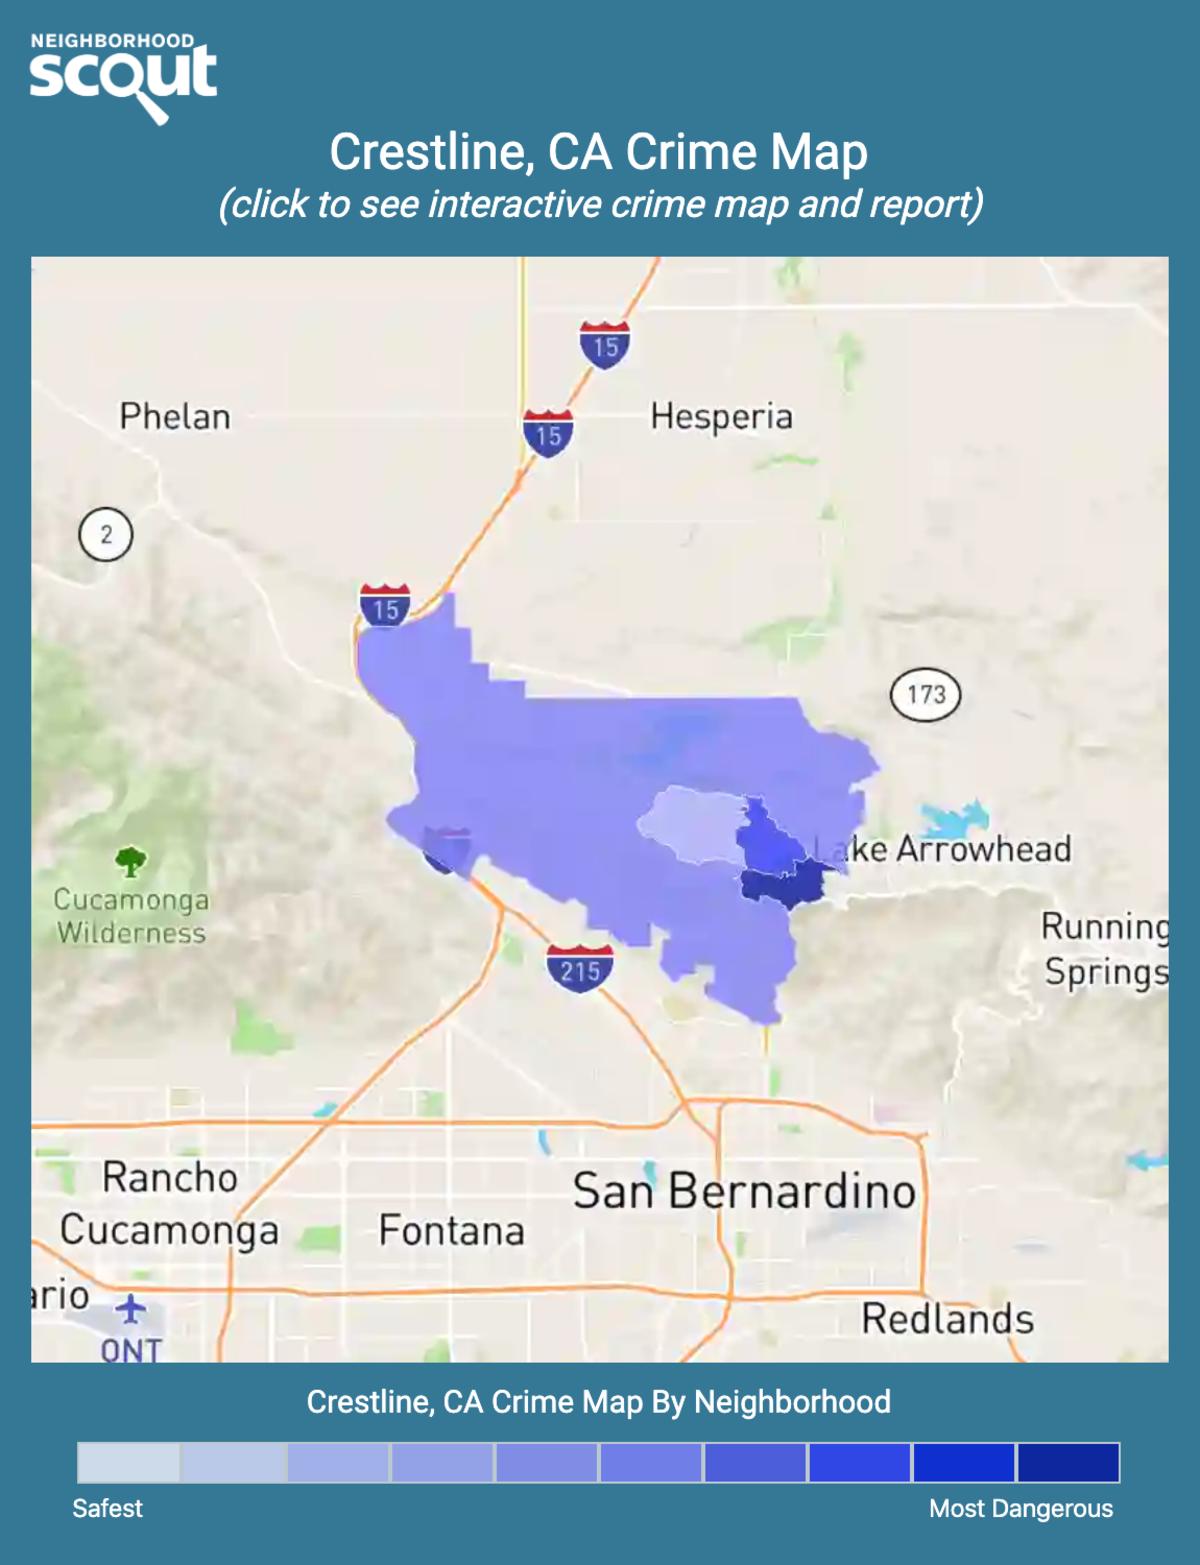 Crestline, California crime map